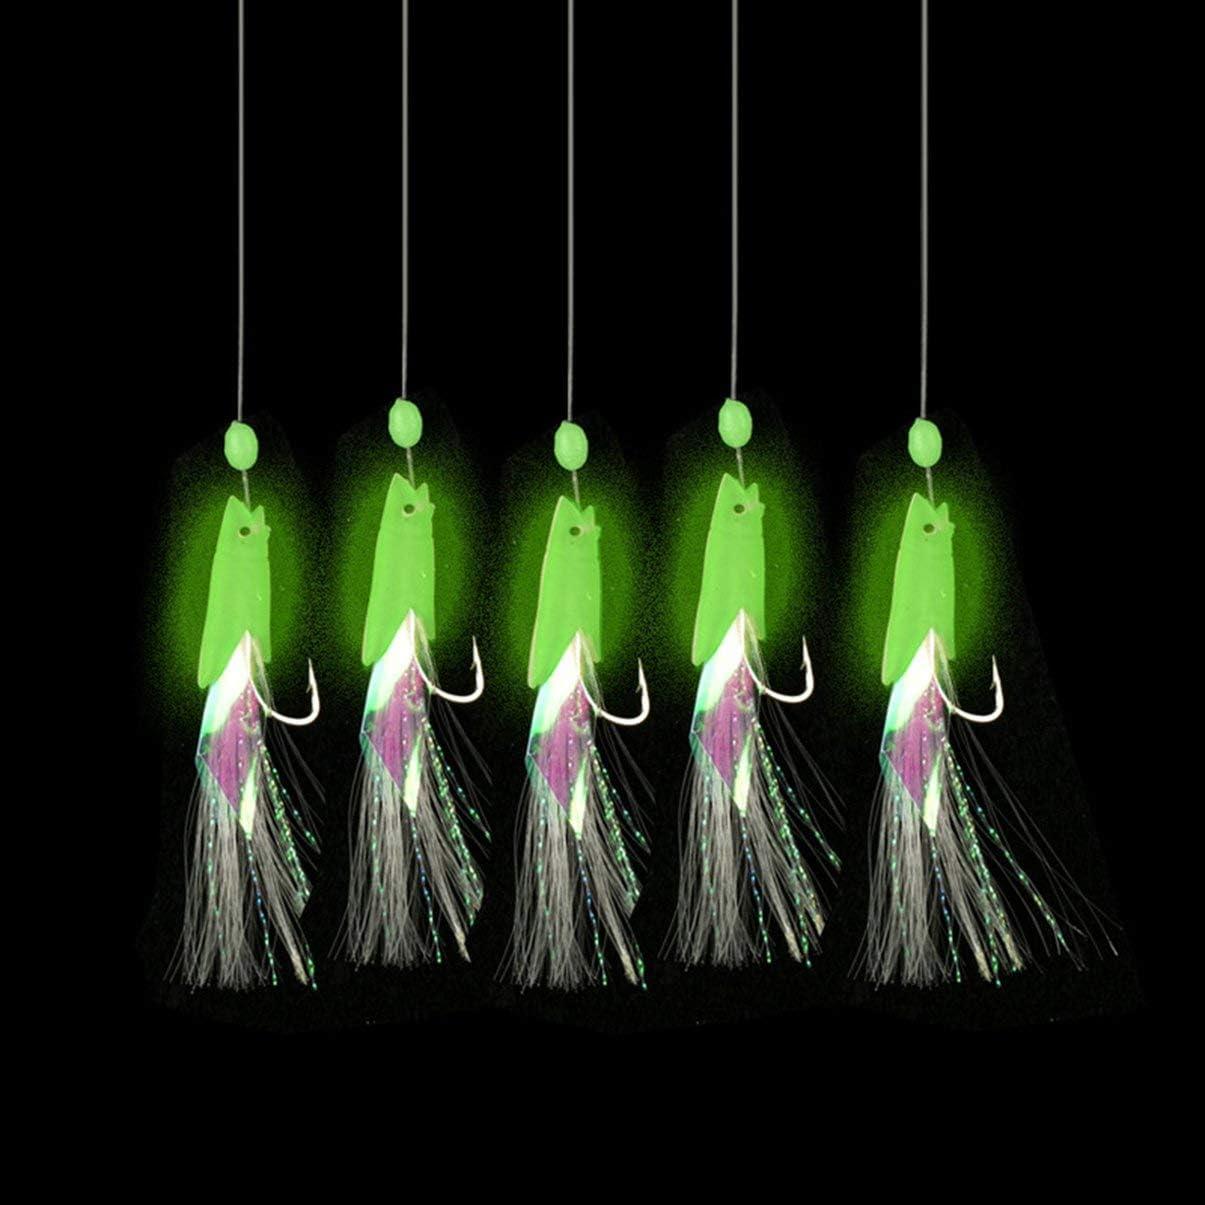 FHJZXDGHNXFGH-IT Esca Morbida per Pesca a sciabola Sabiki Esca Luminosa a Forma di Testa di Pesce